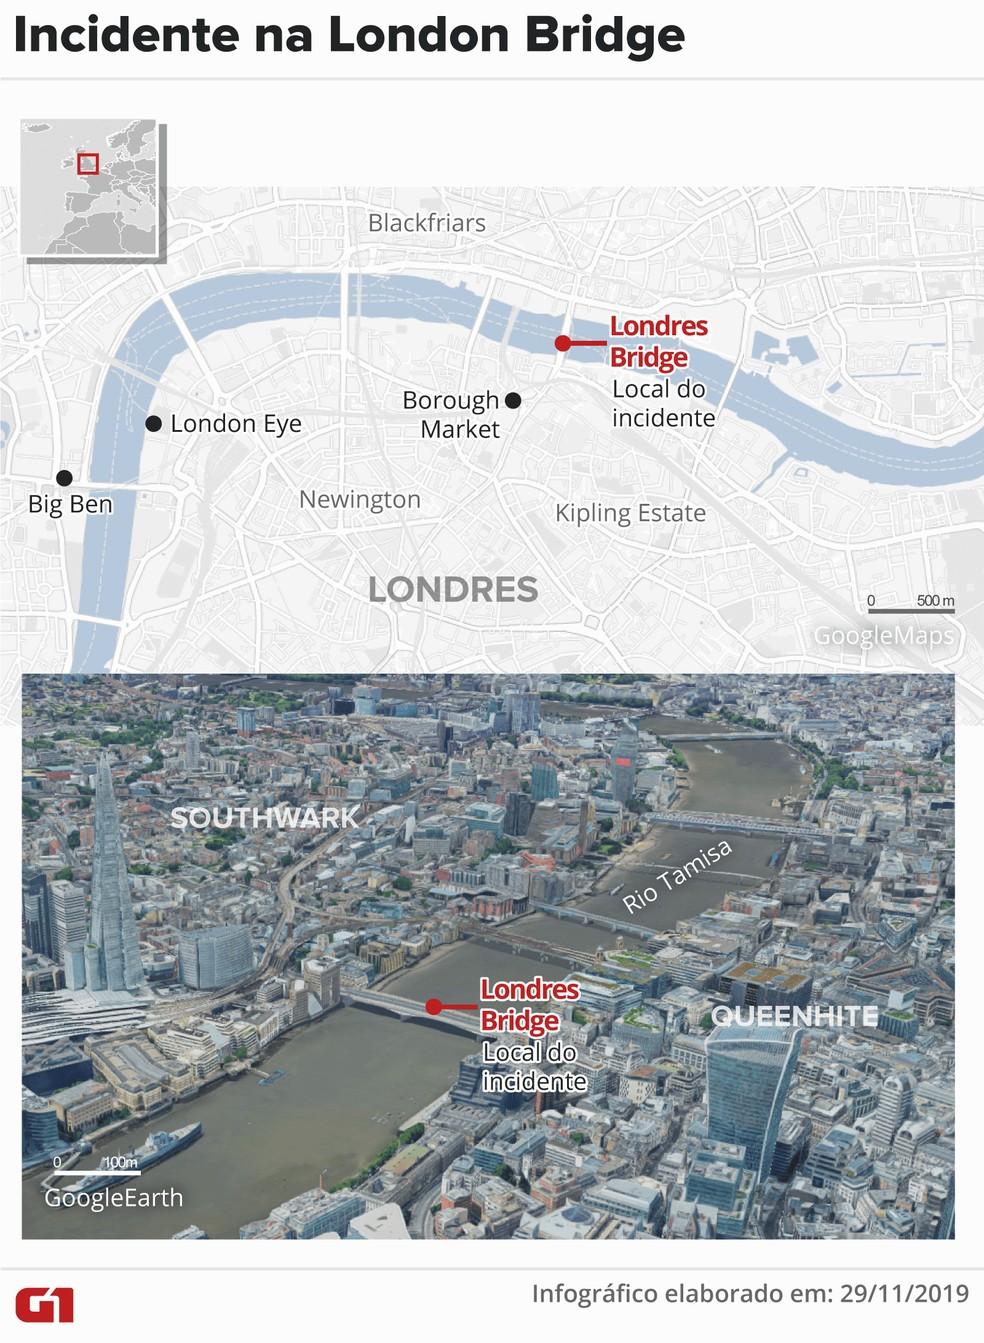 Mapa mostra local do incidente na London Bridge — Foto: Juliane Souza/G1